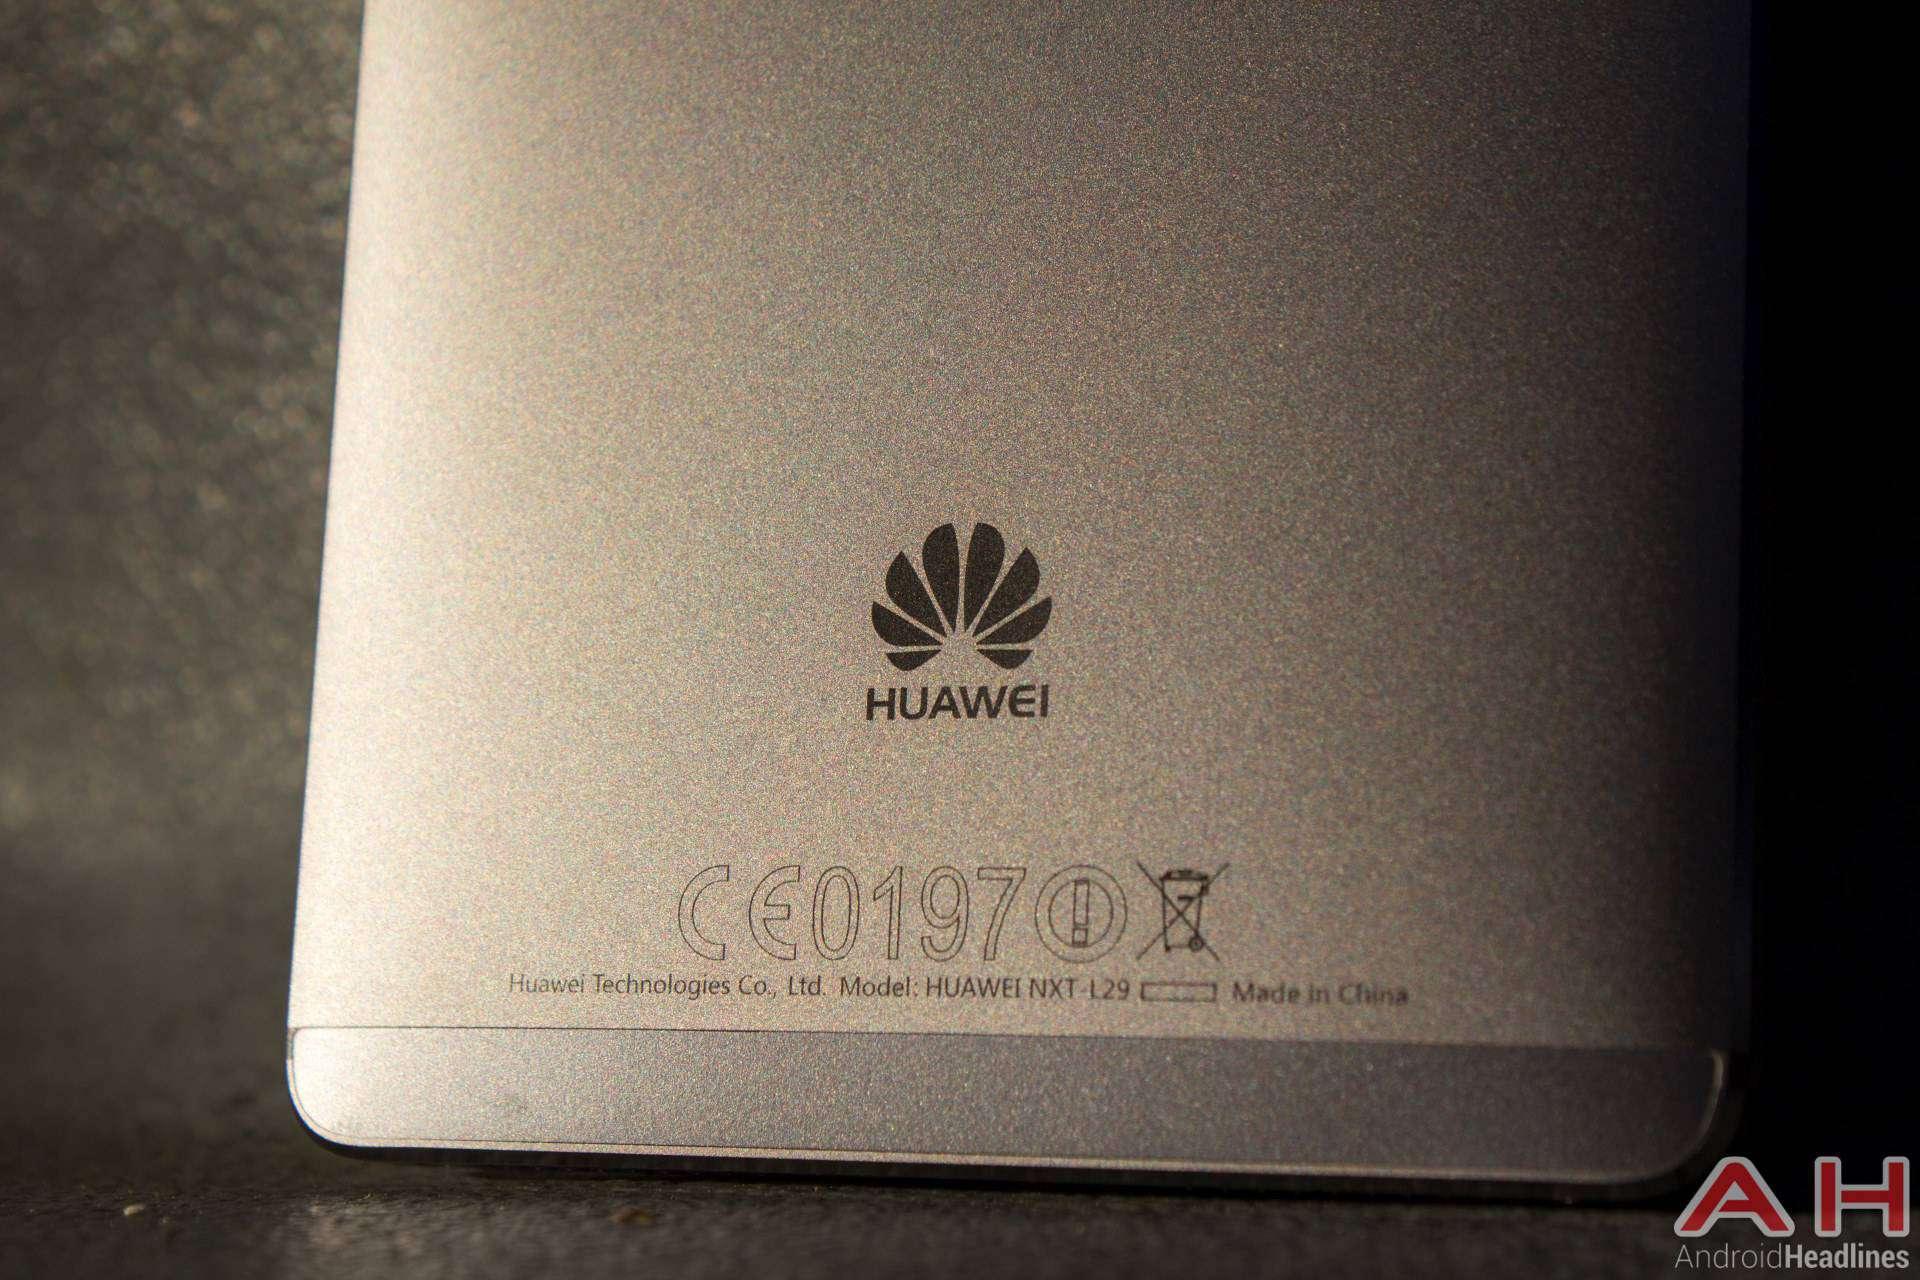 Huawei Mate 8 AH NS logo 2